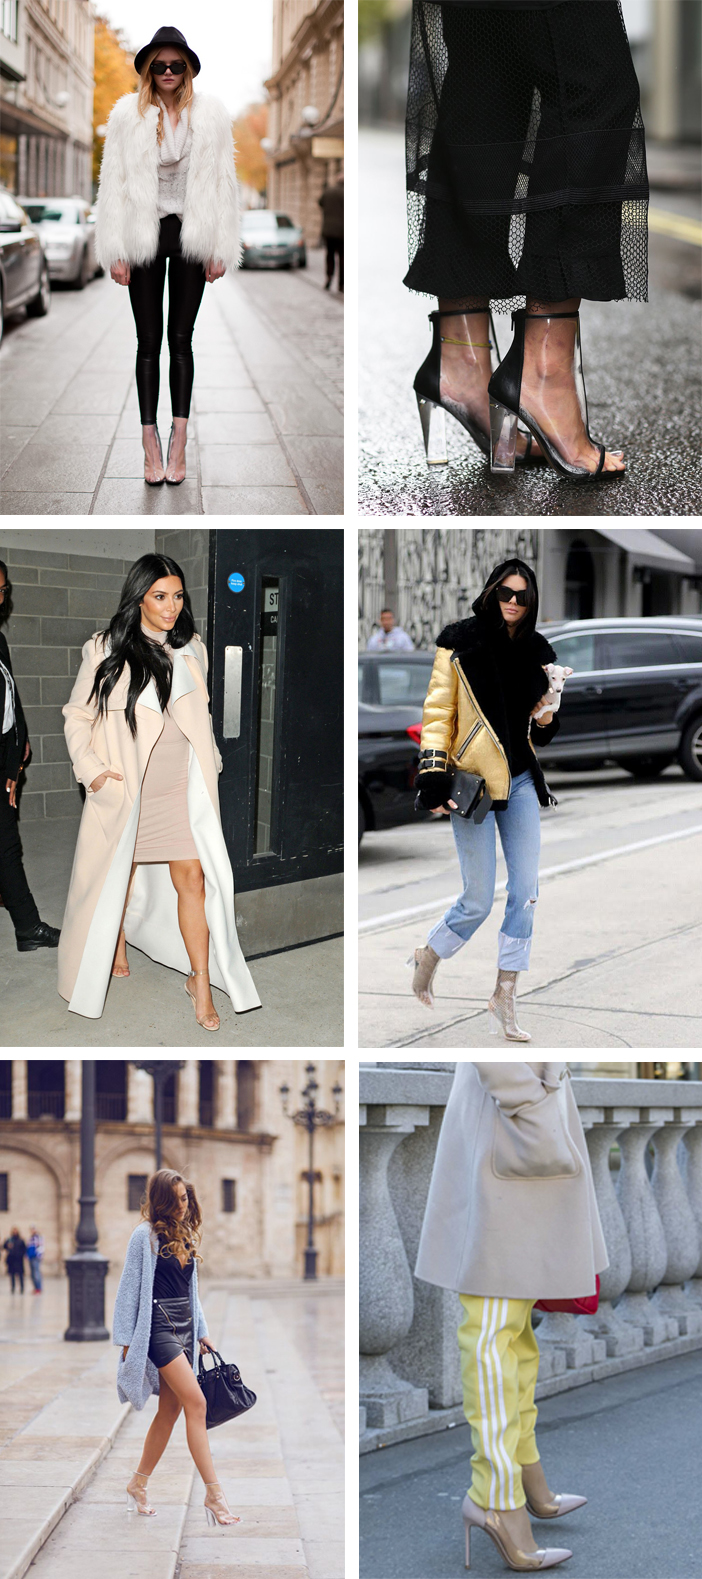 Hot or Not - Sapatos transparentes